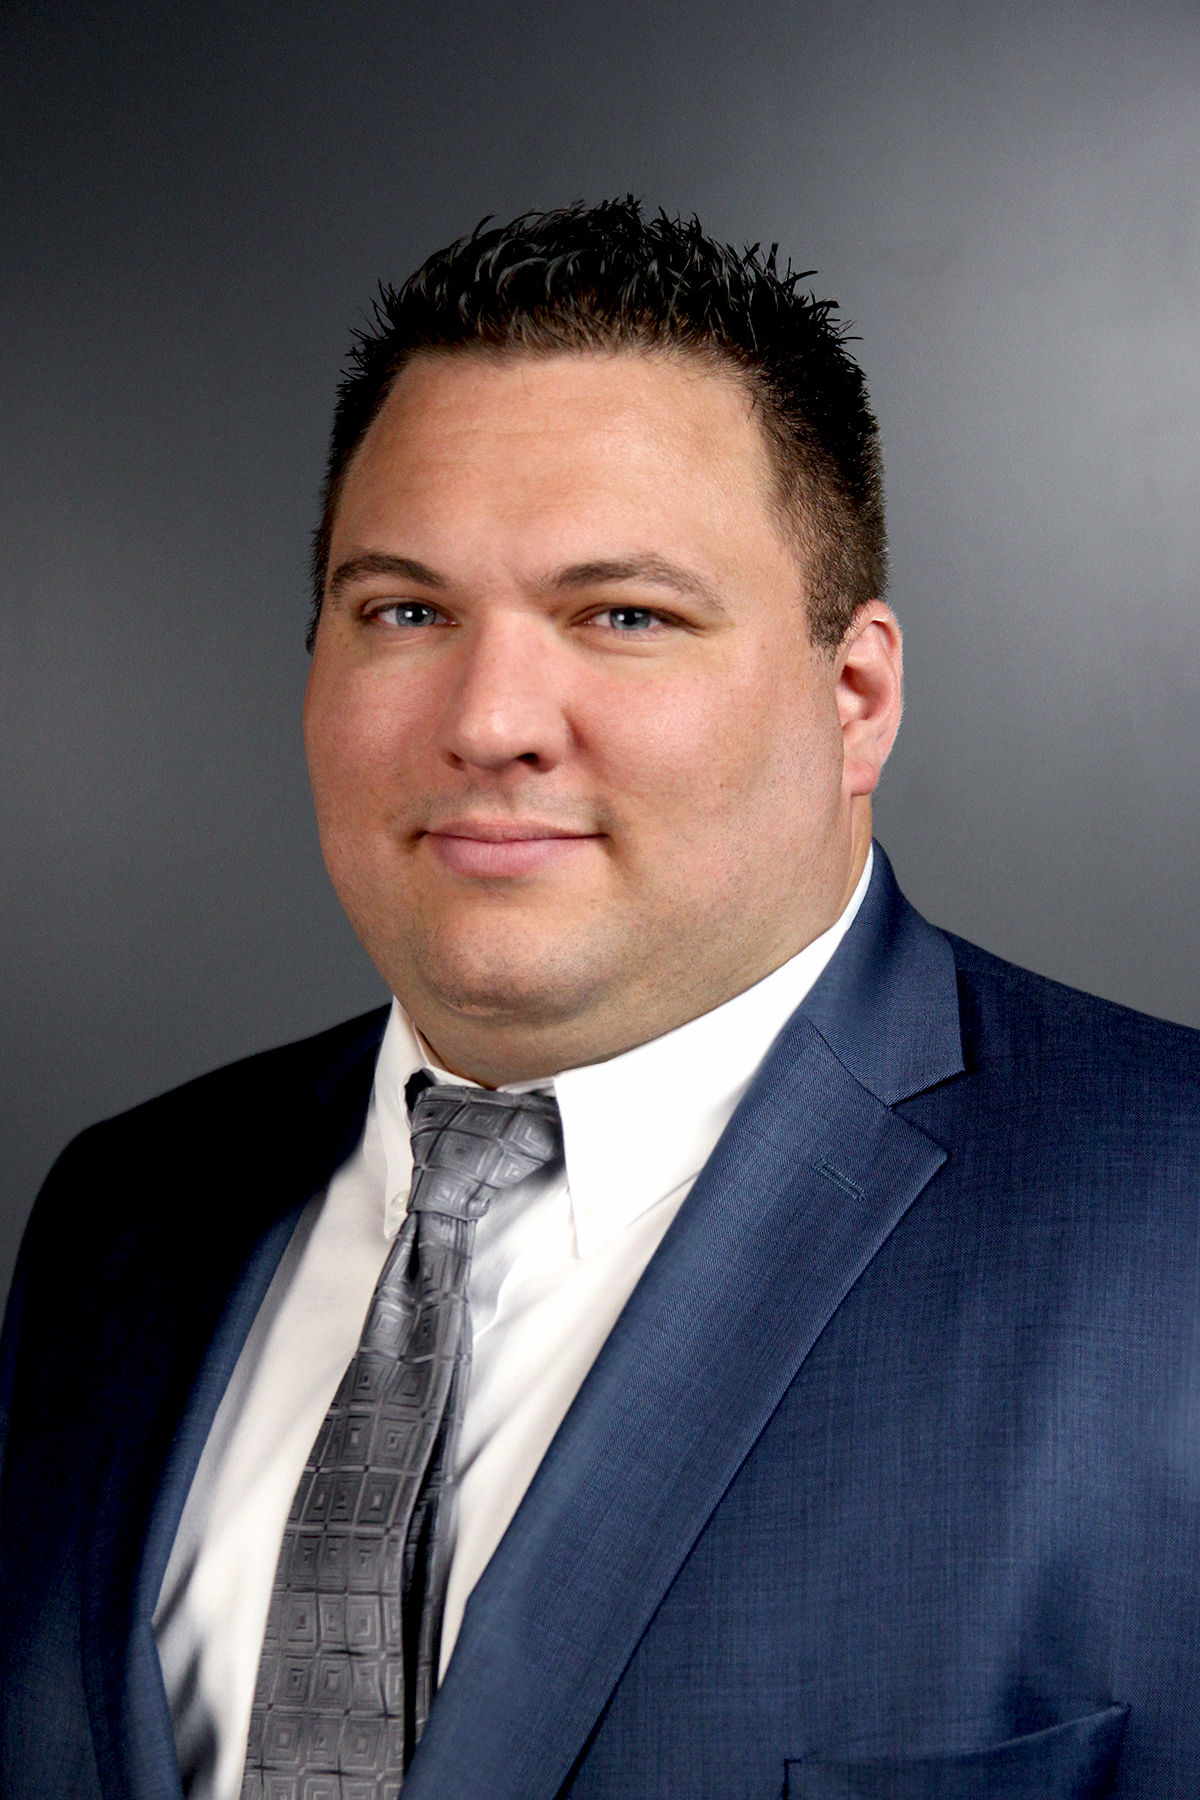 Kevin Rosen